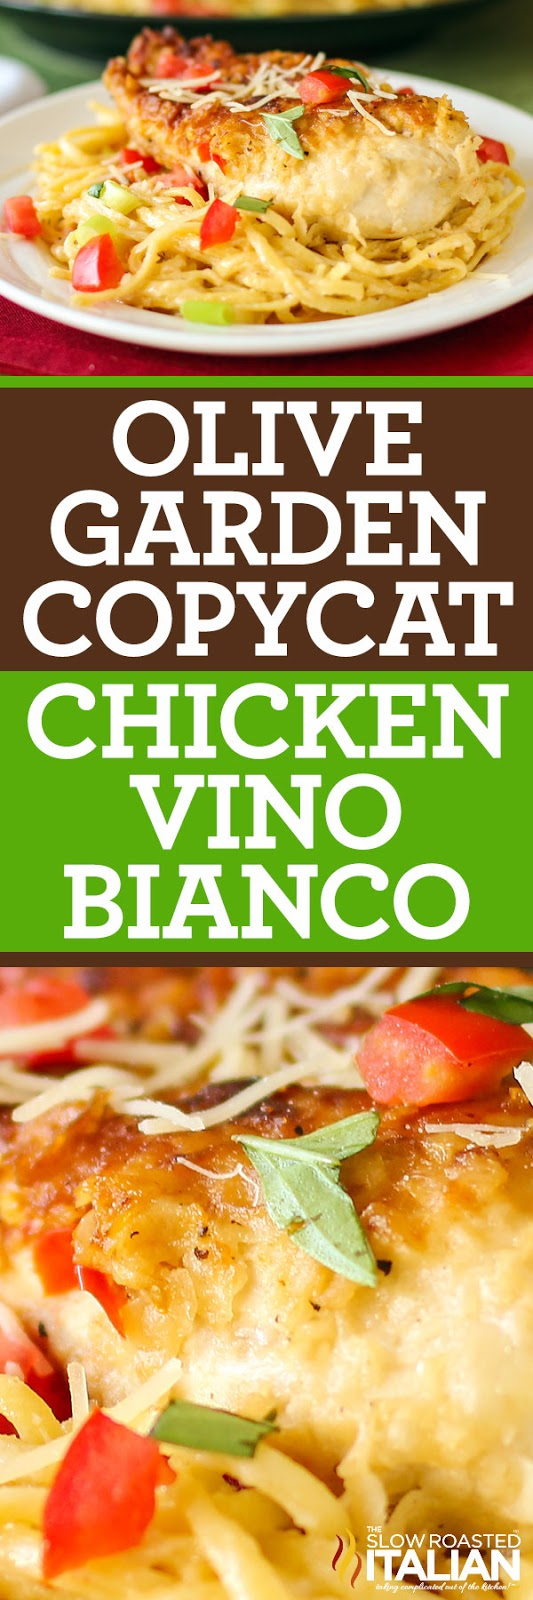 Olive Garden Copycat Chicken Vino Bianco (With VIDEO) do